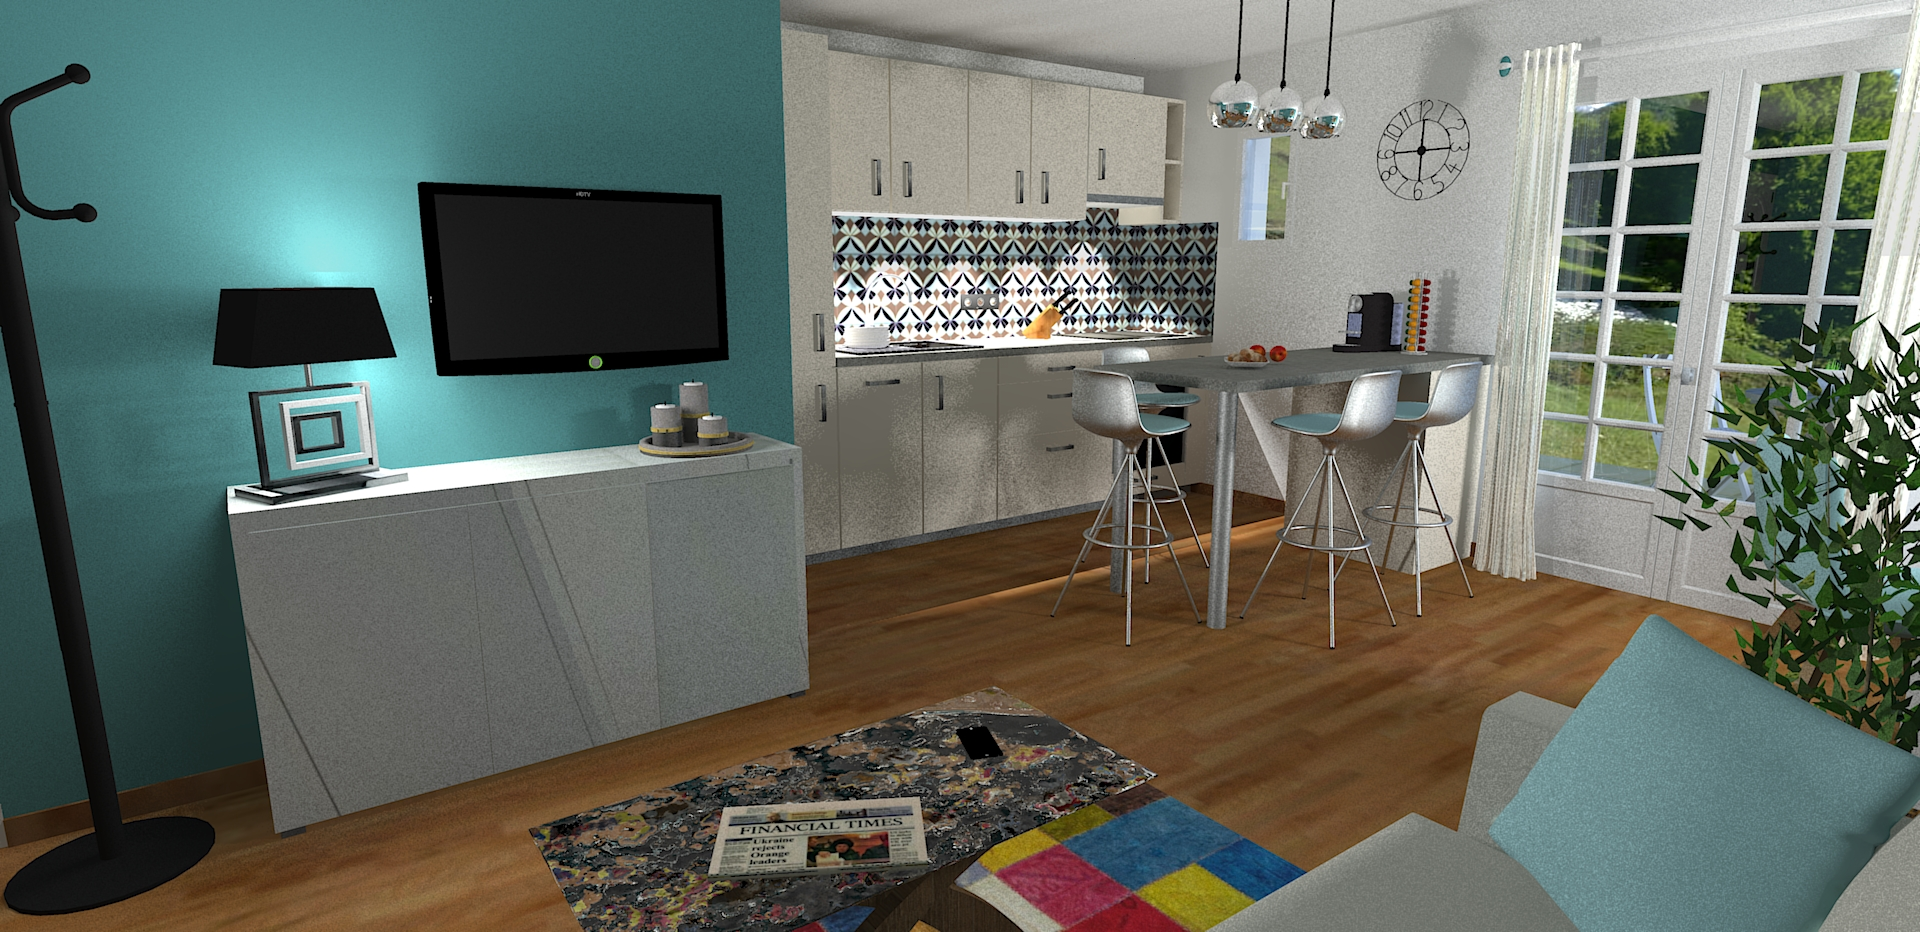 vue sur mer st cyr sur mer novembre 2016 aura. Black Bedroom Furniture Sets. Home Design Ideas